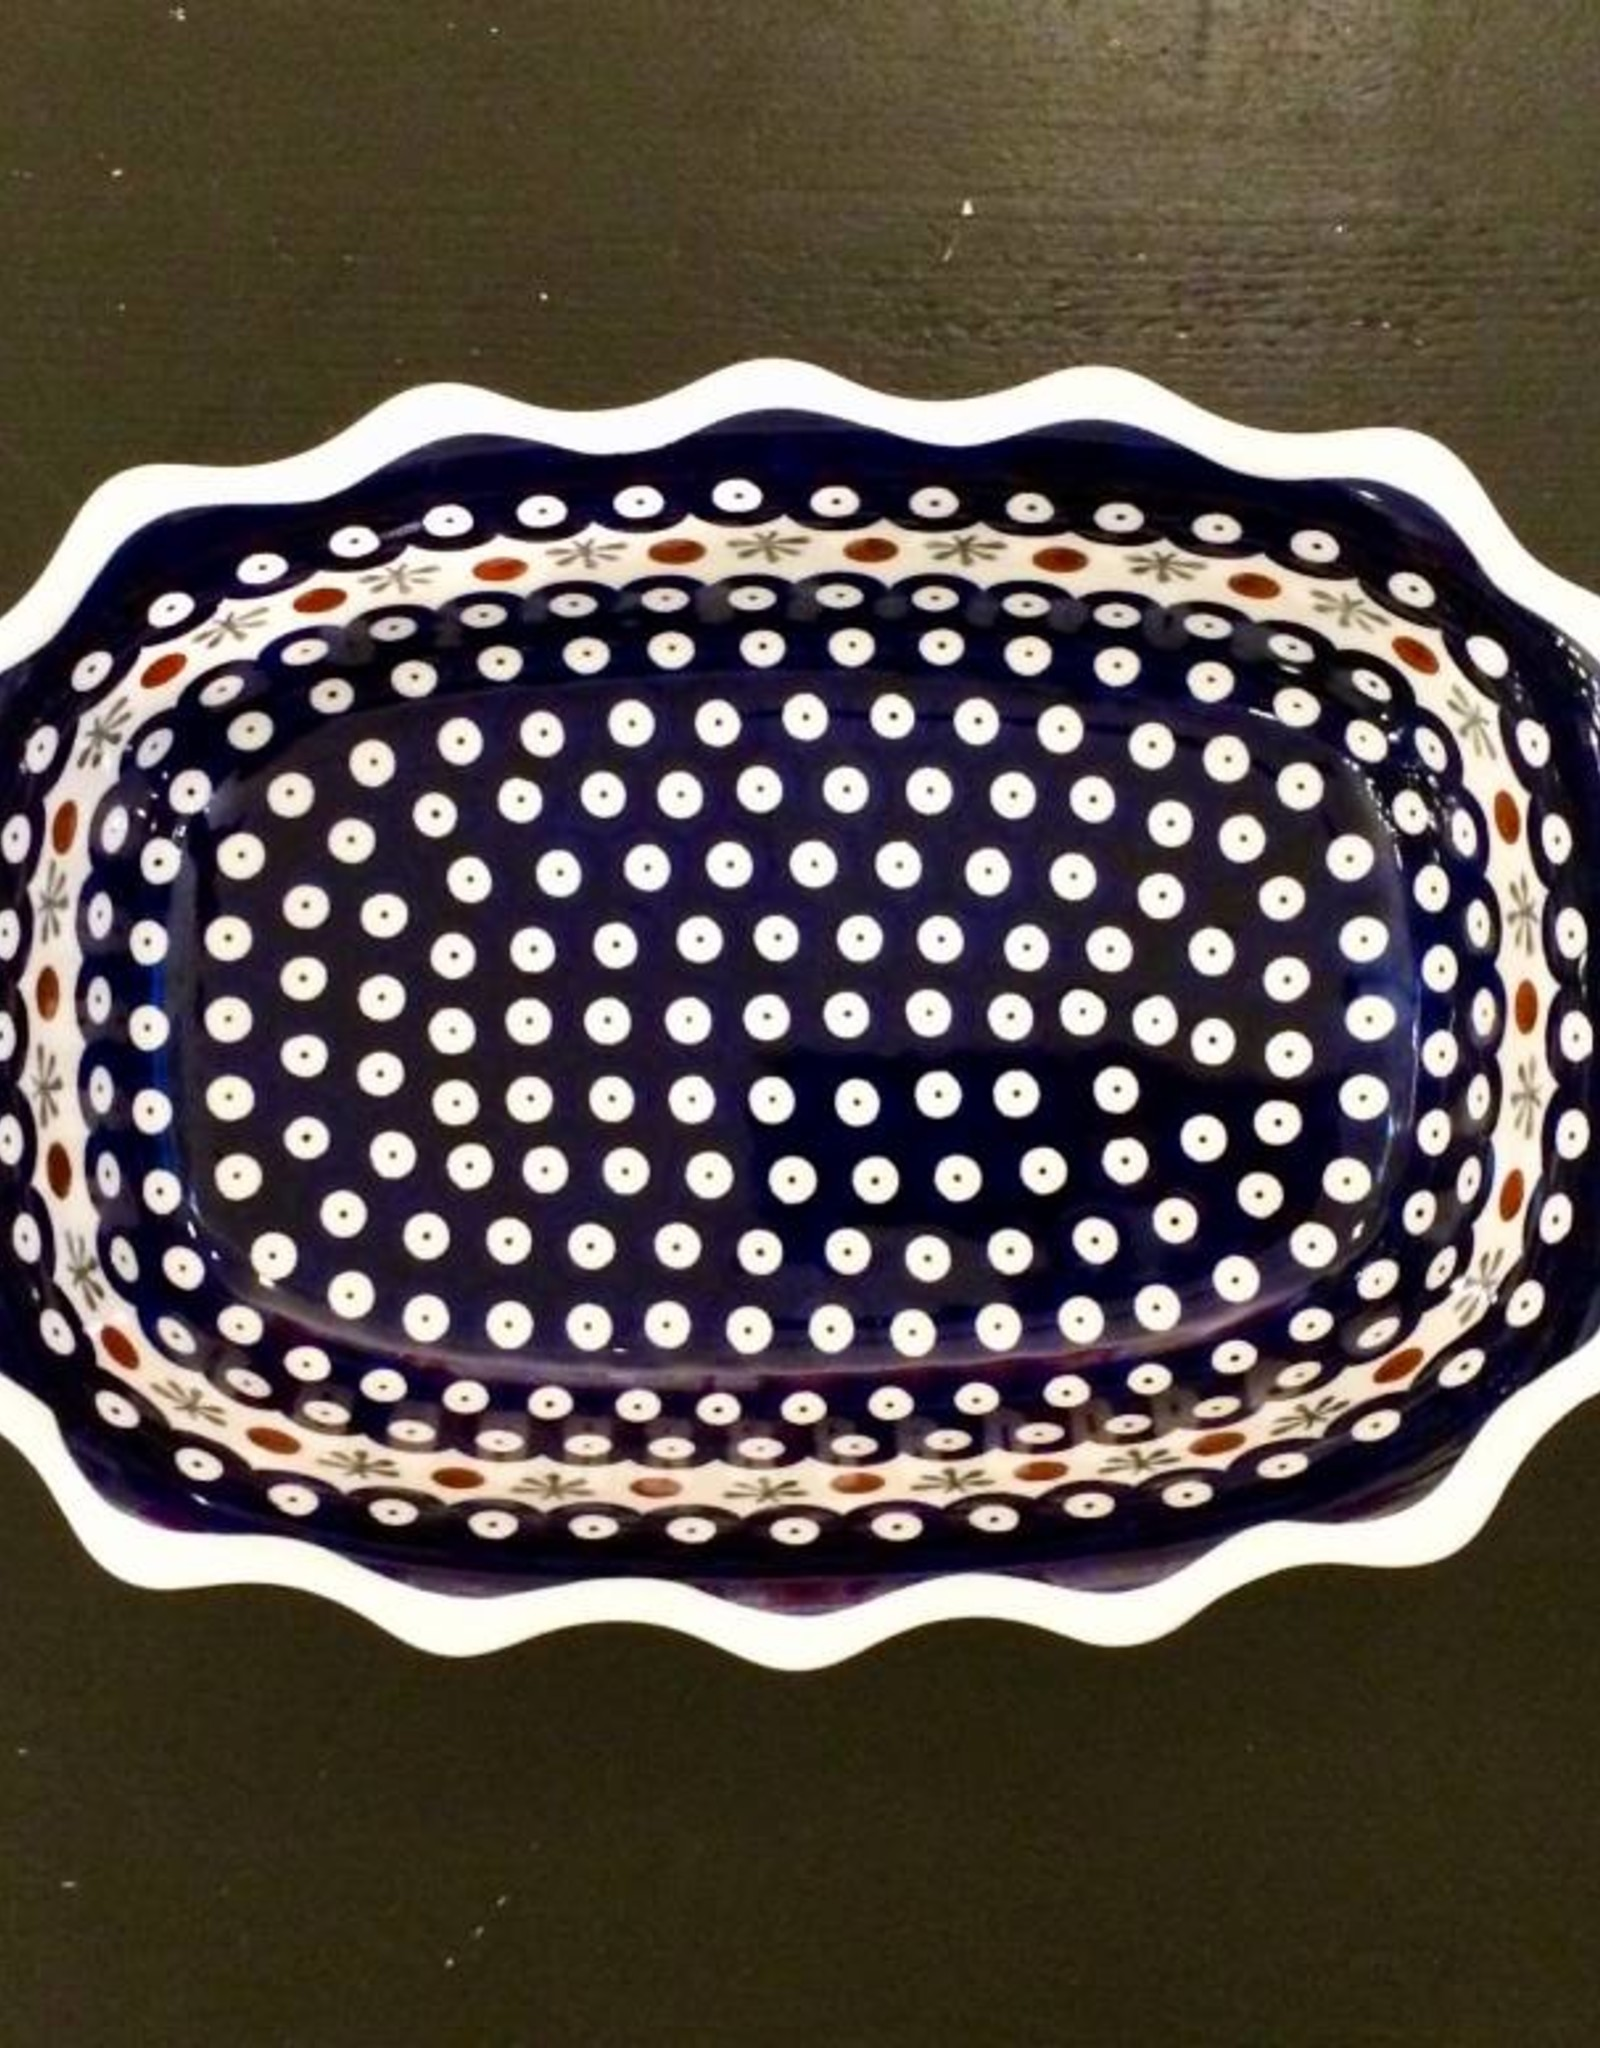 Scalloped Dish - Old Poland